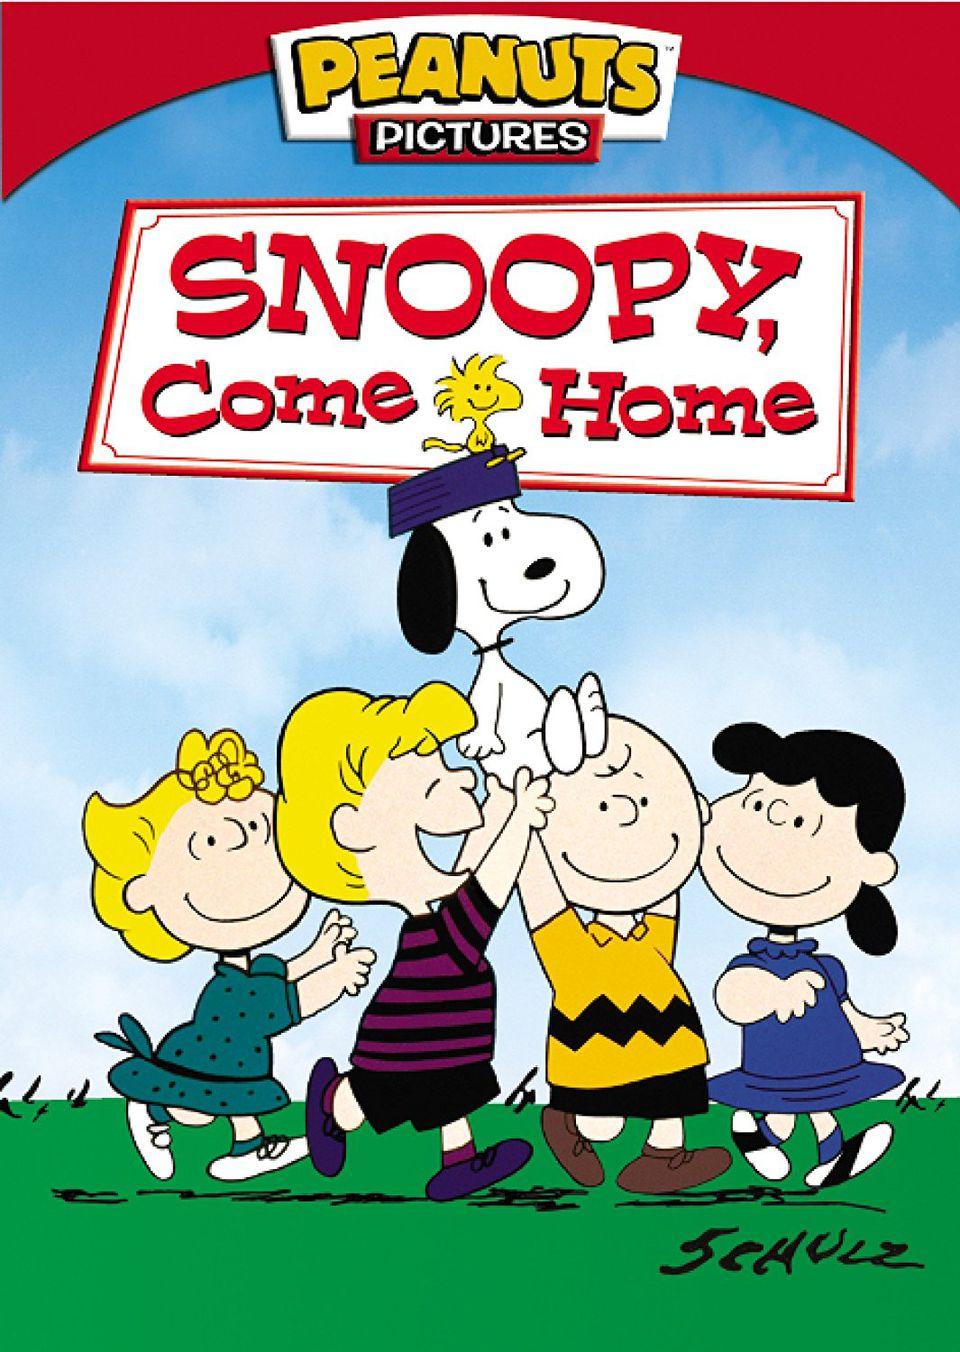 snoopy come home movie